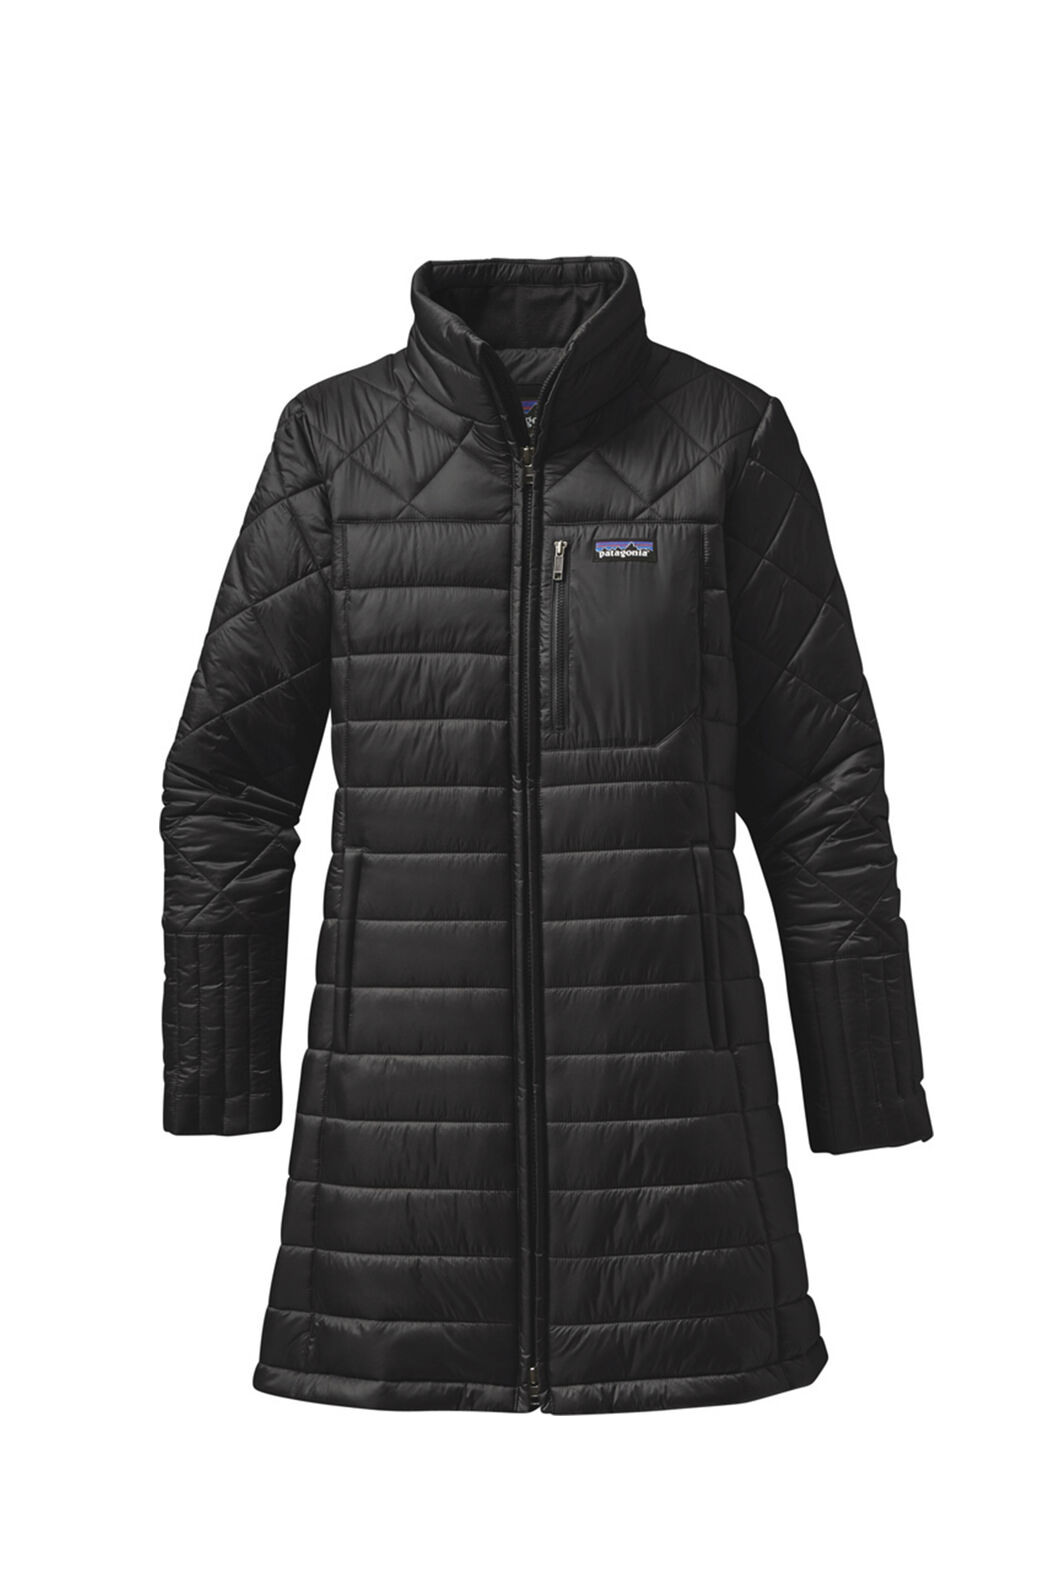 Patagonia Women's Radalie Parka Jacket, Black, hi-res